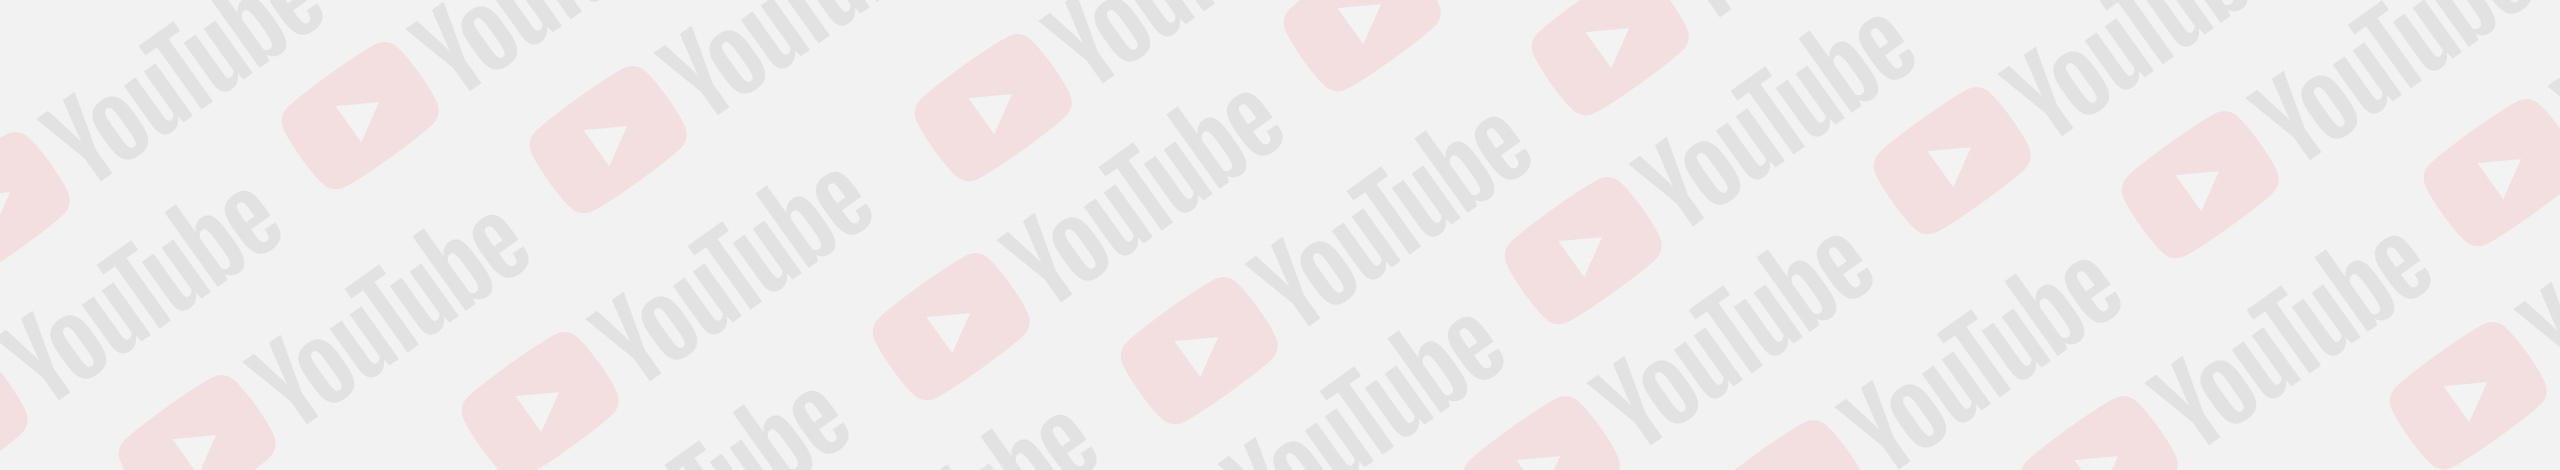 YouTube Homepage Banner with Steve Spangler